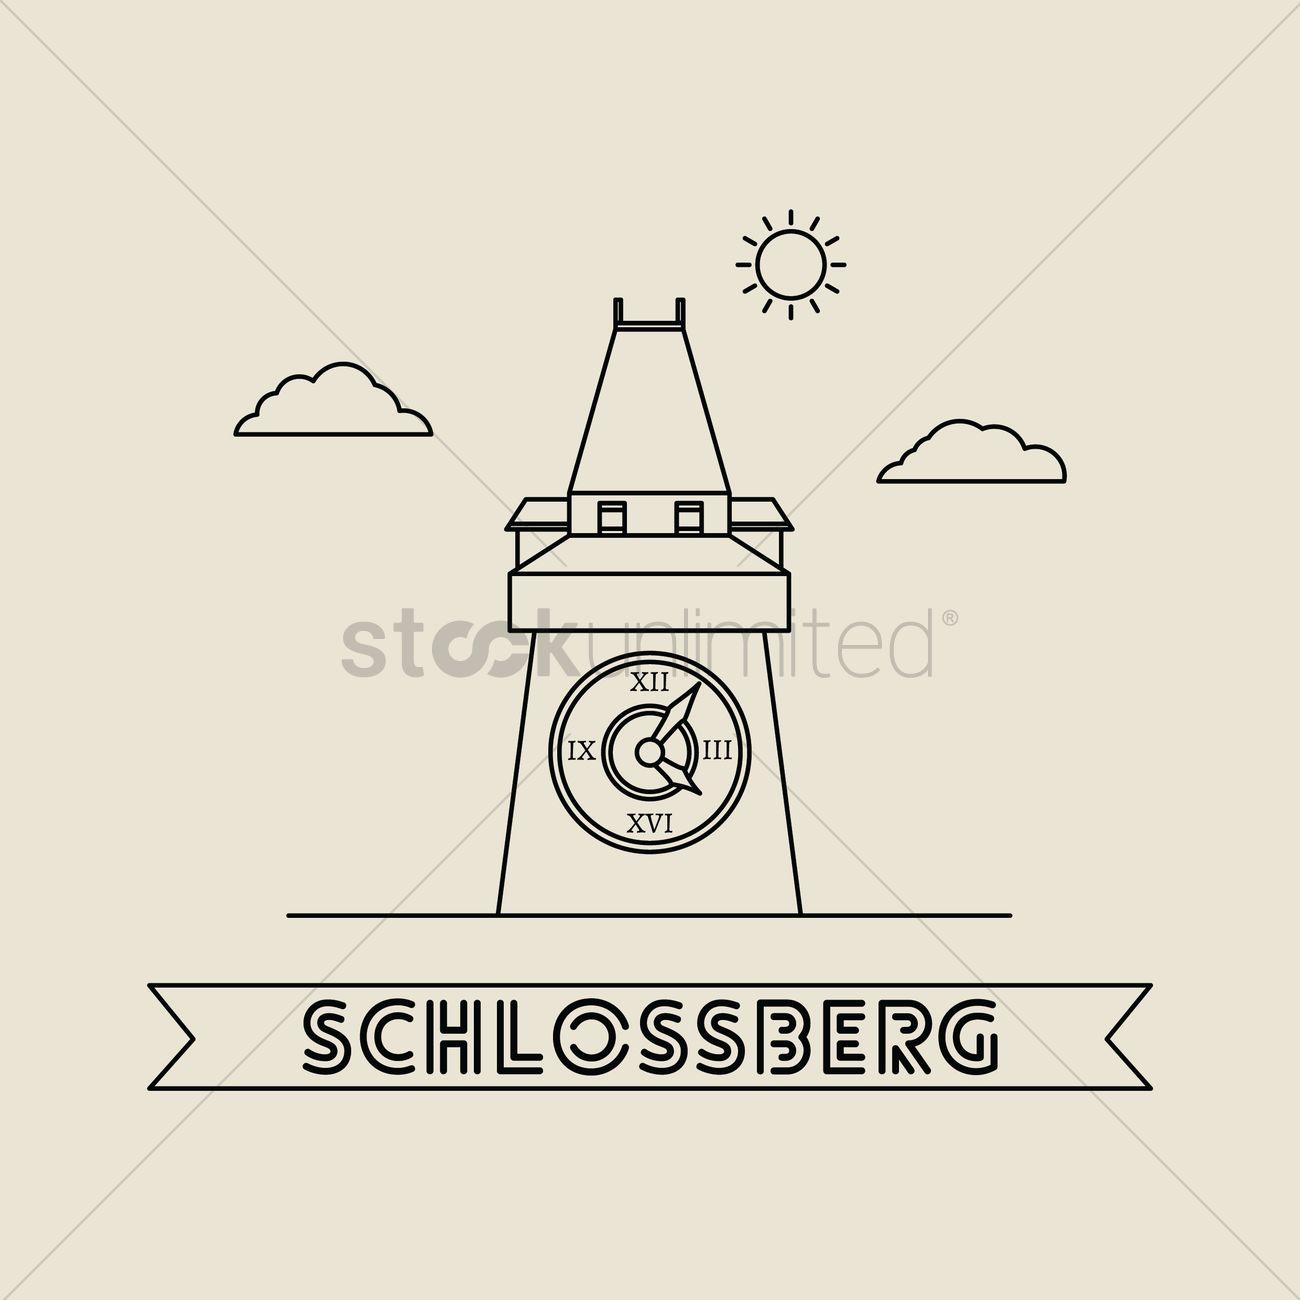 Schlossberg Vector Image.